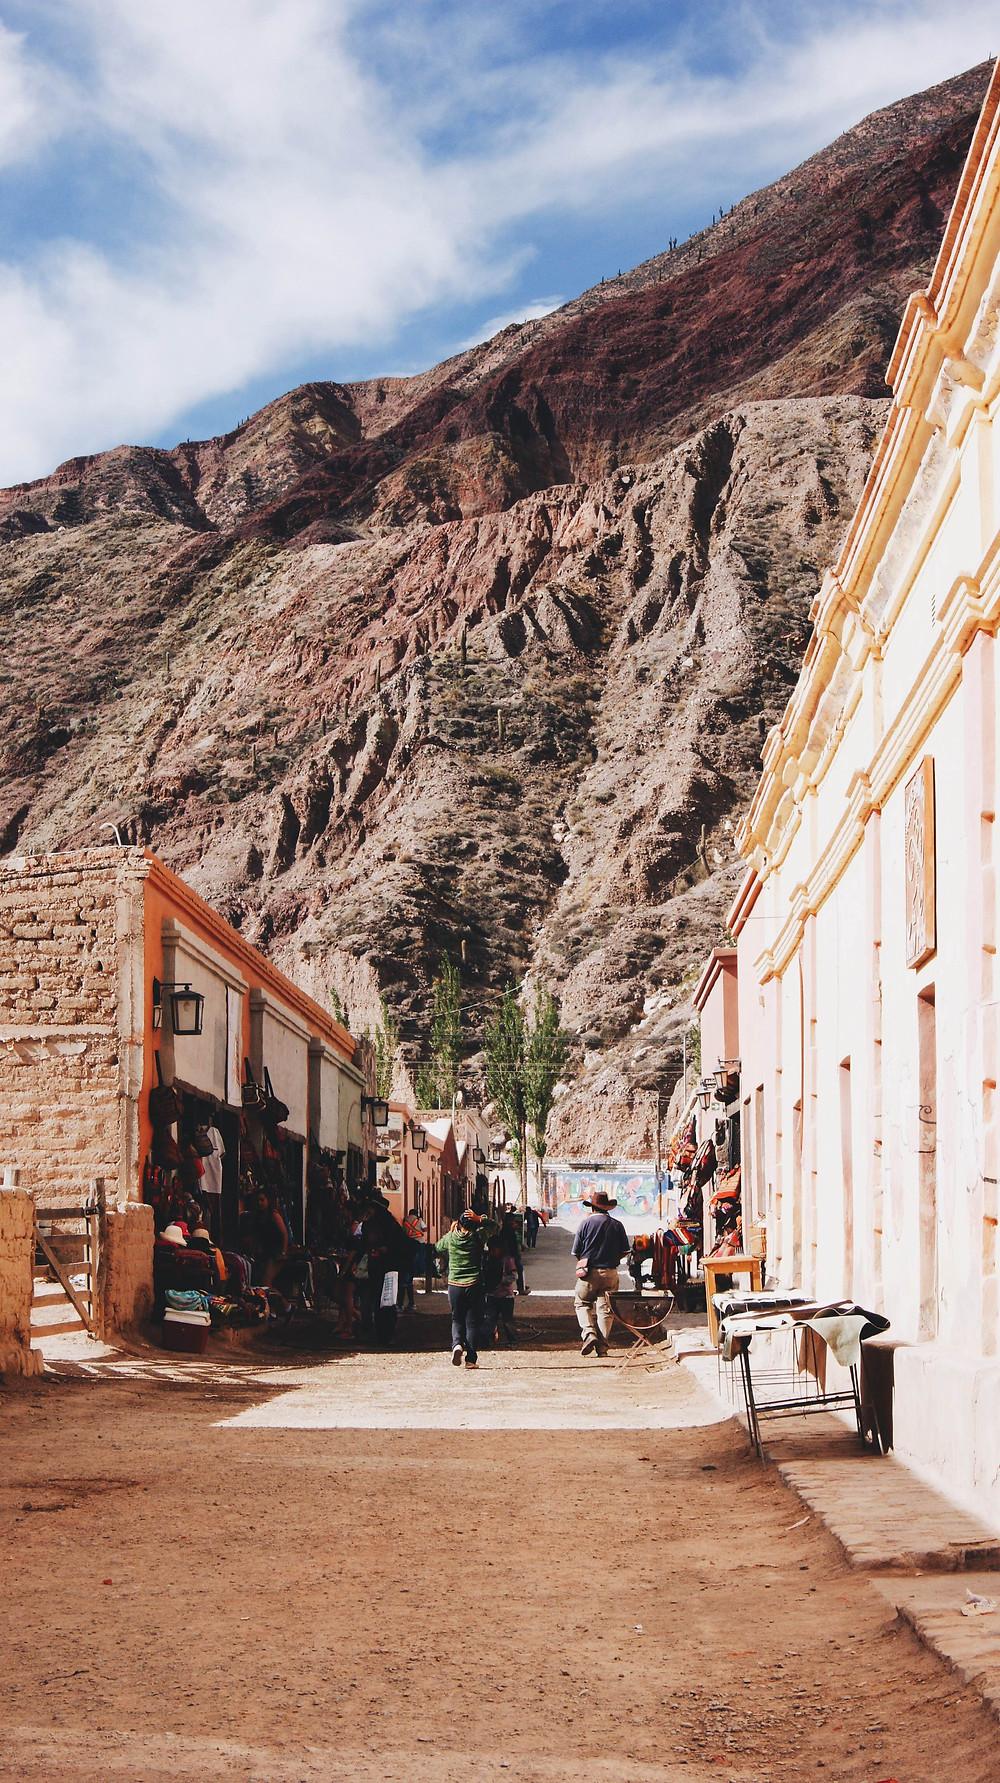 Centro de Purmamarca, Argentina - 2015 - Foto Raquel Bloomfield